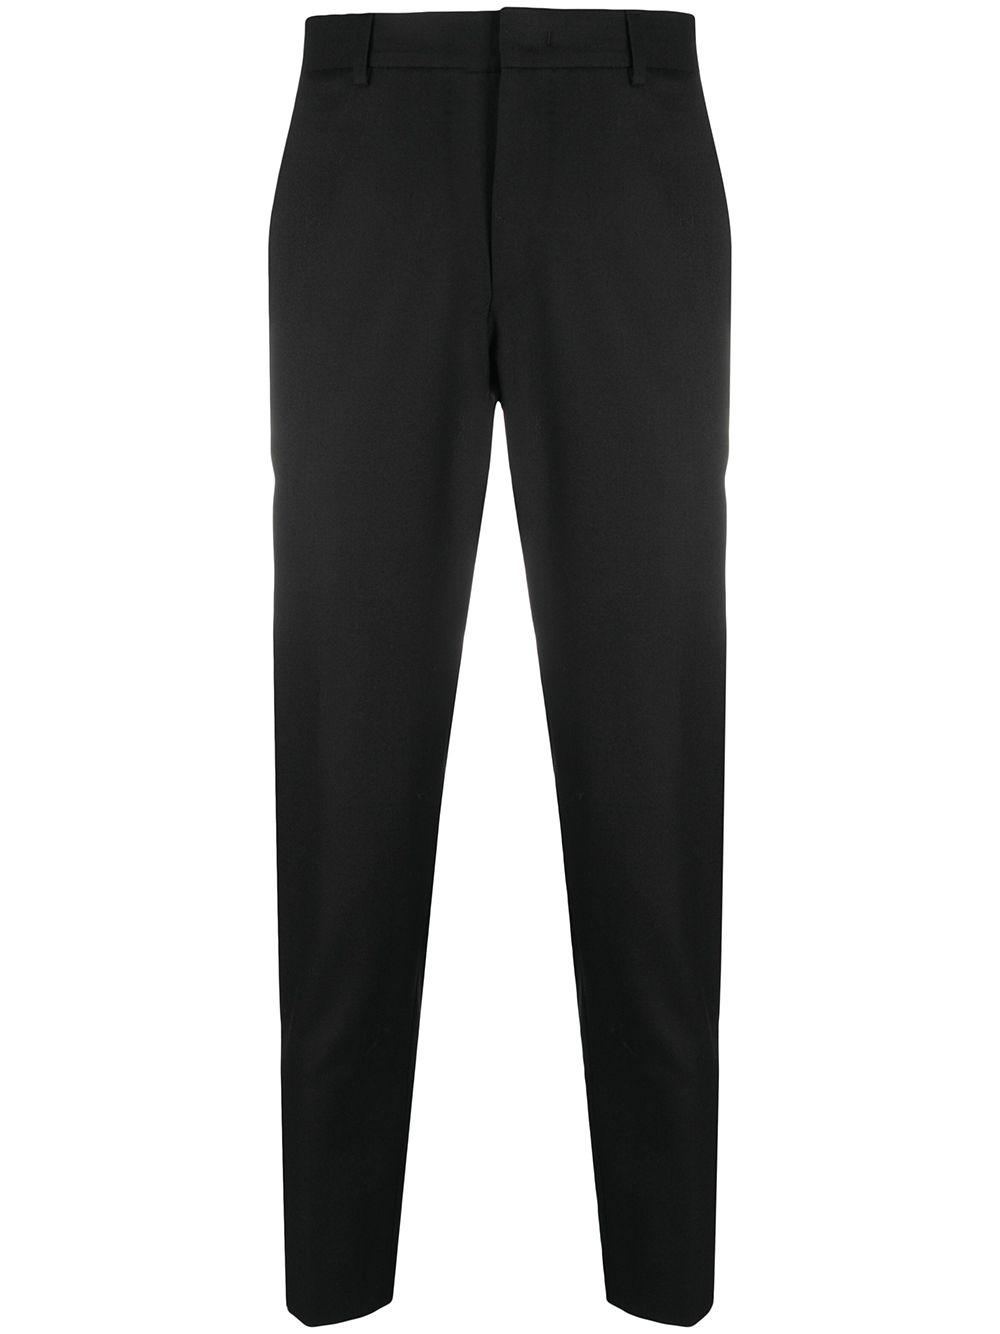 Black virgin wool blend tapered-leg tailored trousers  PT01 |  | COASEPZ10KLT-PO630990